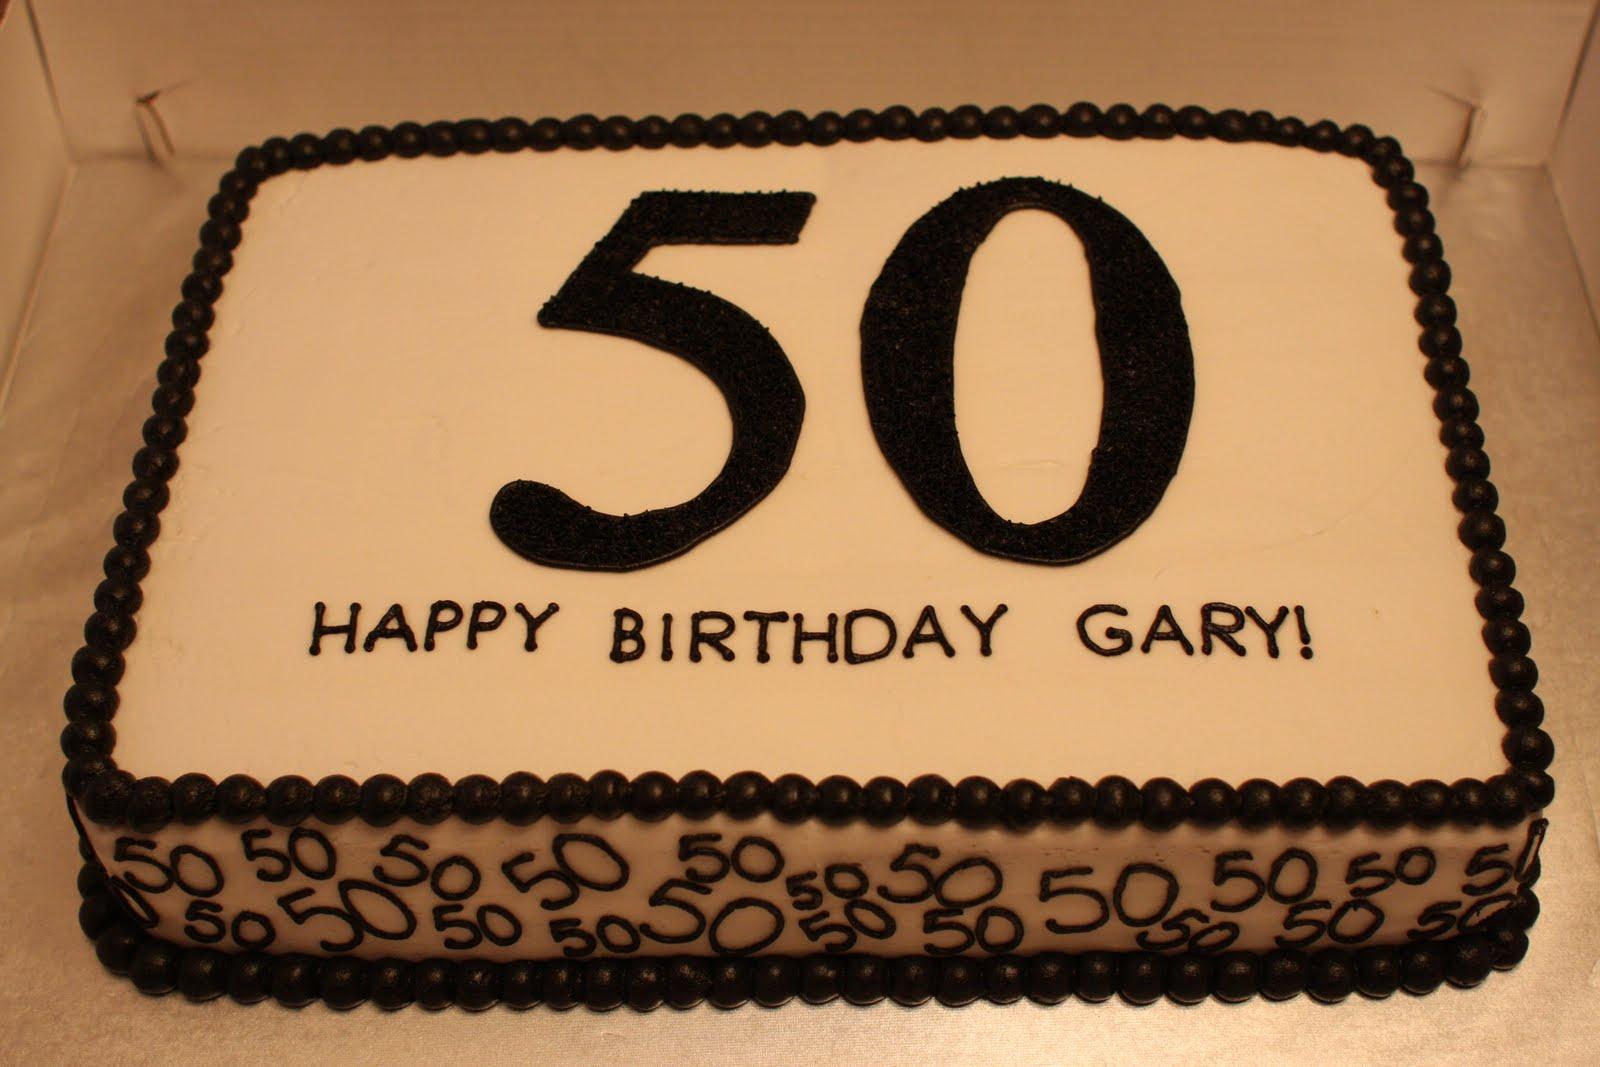 50th Birthday Sheet Cake Decorations Him